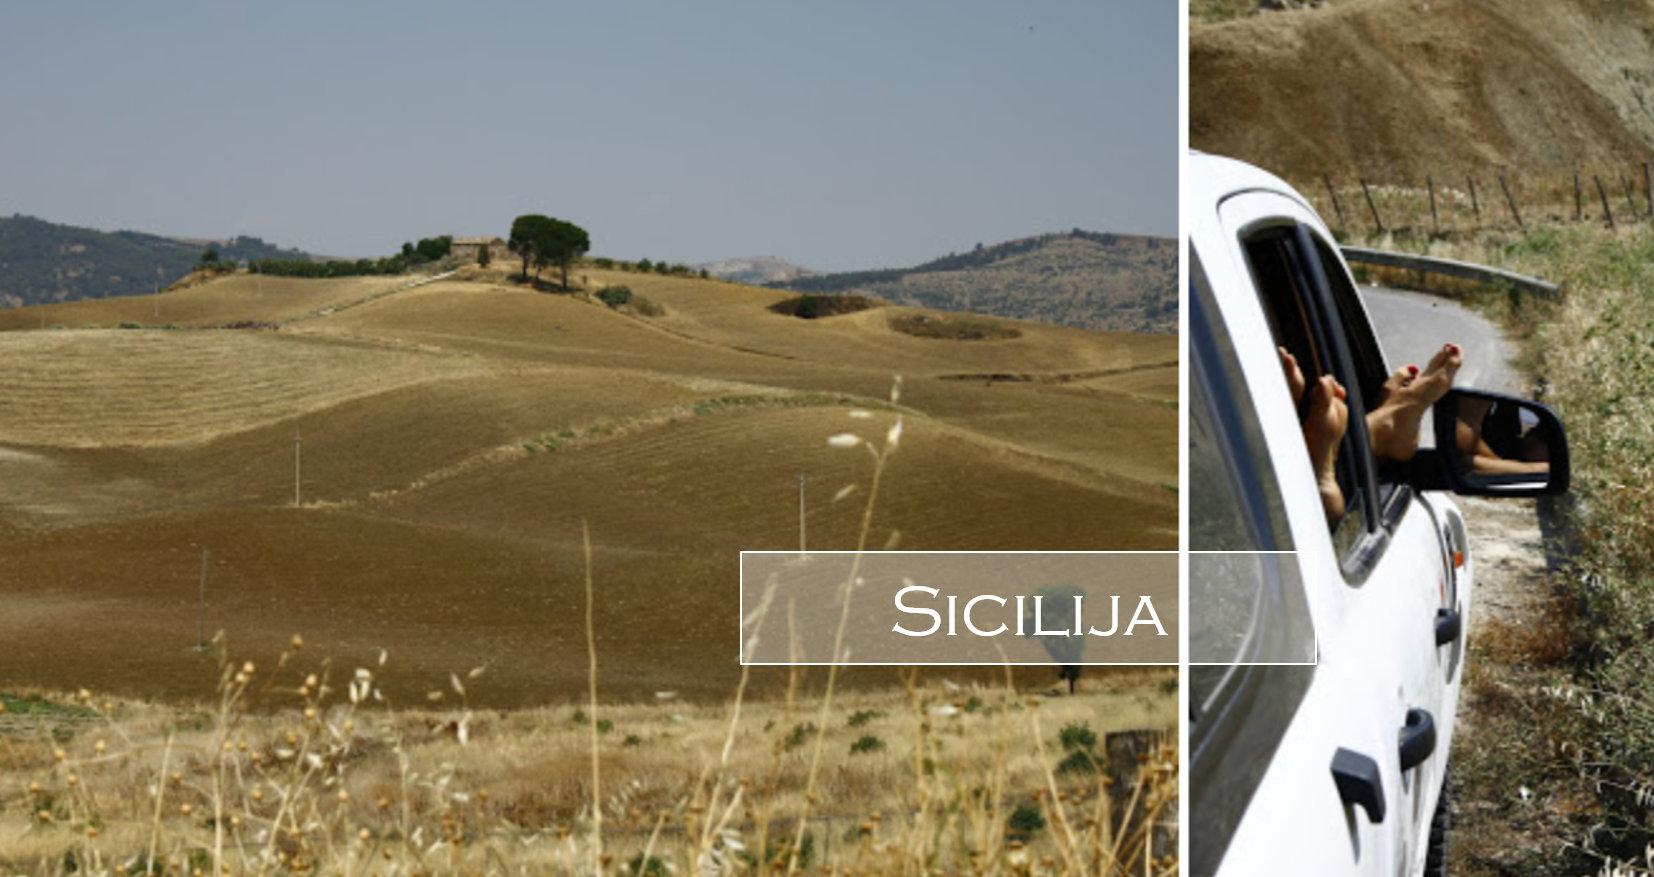 Sicilija.jpg